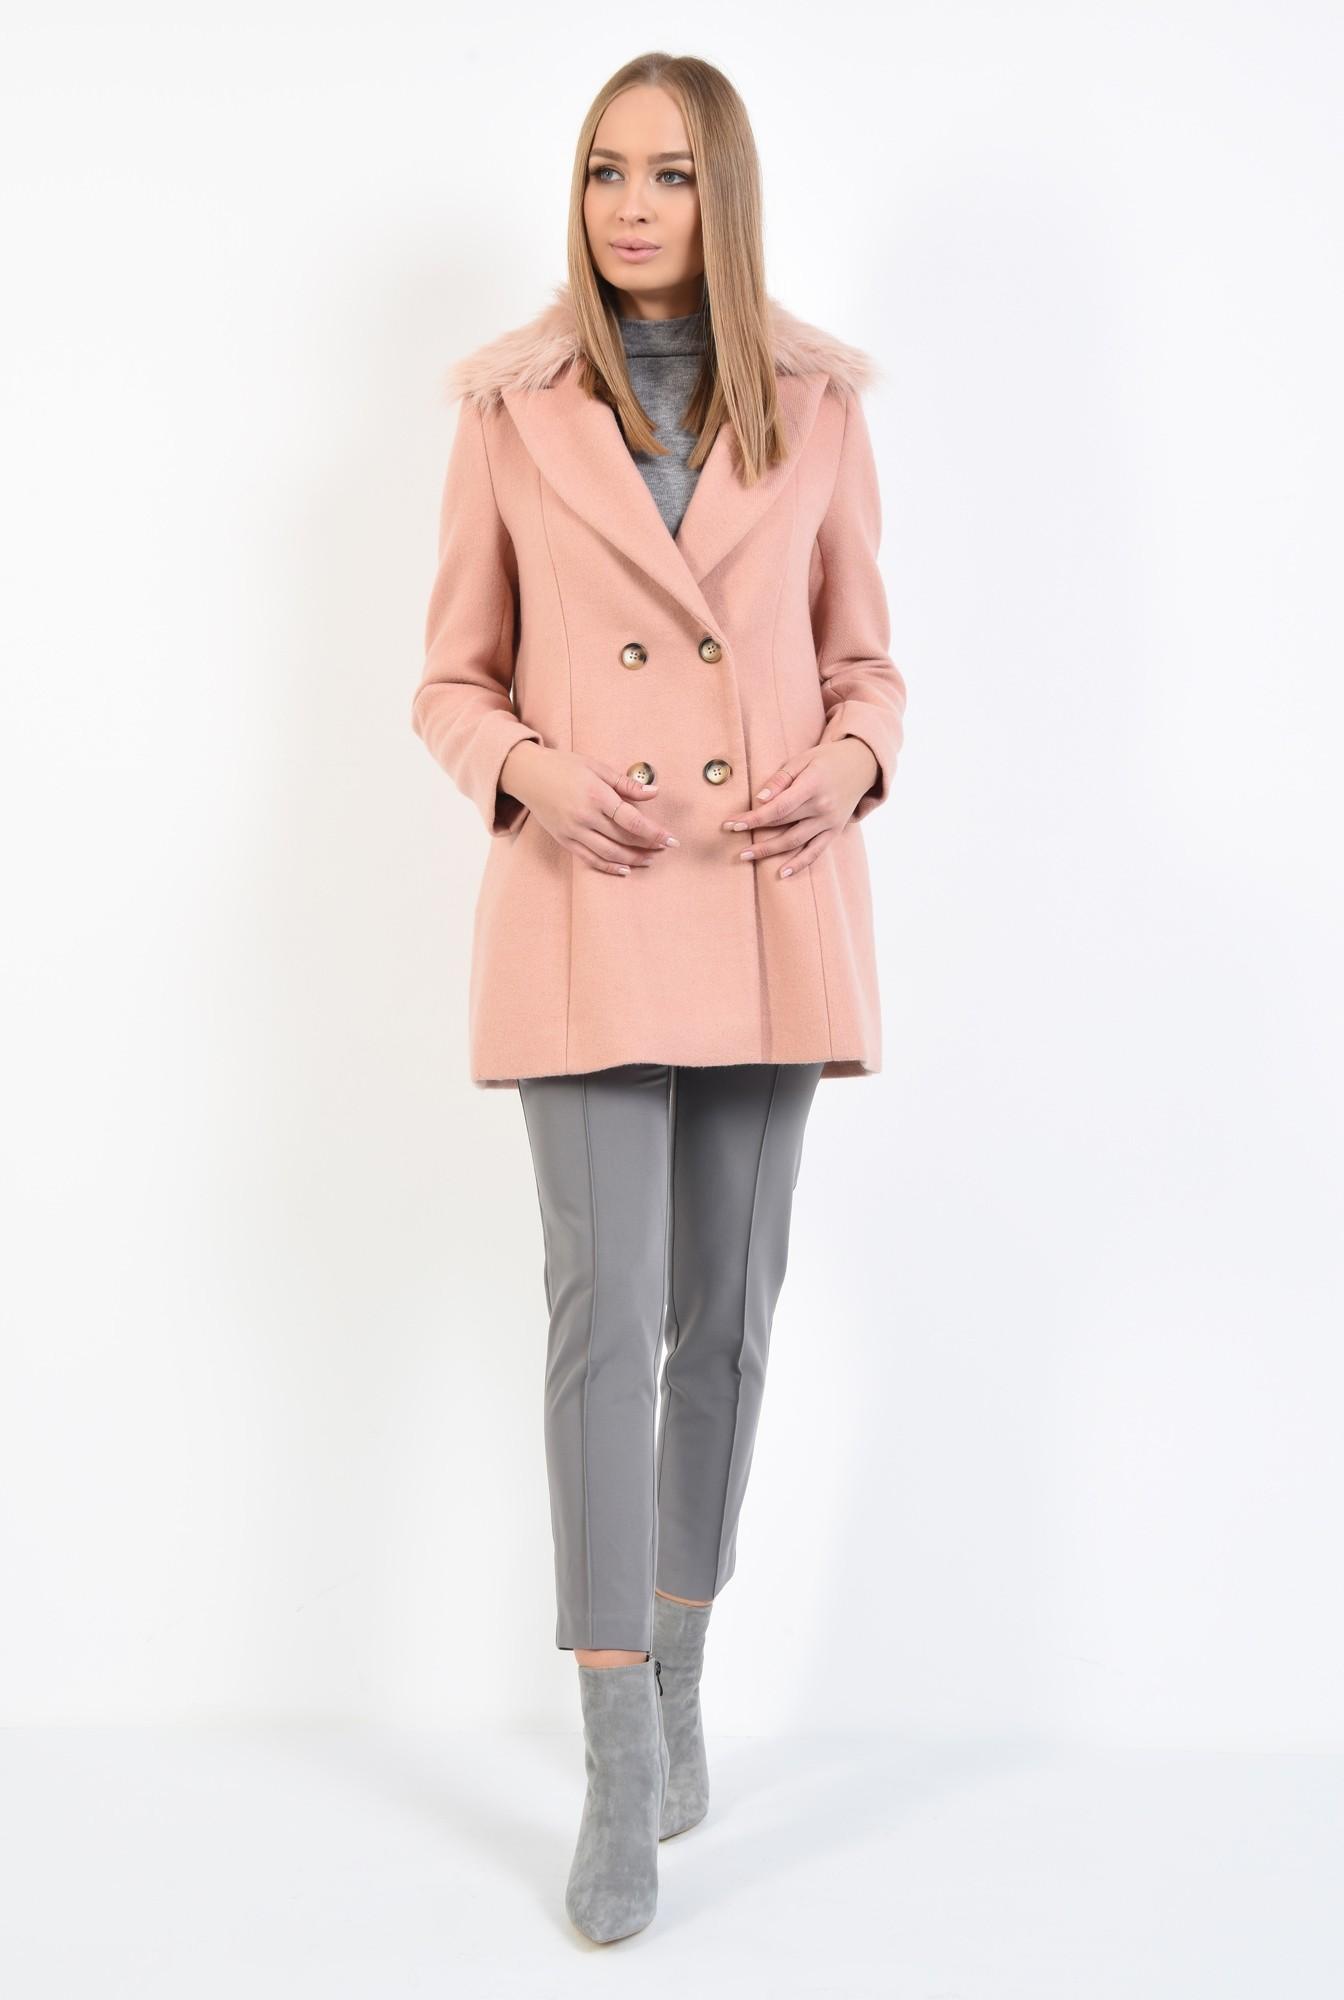 3 - palton din lana, roz, doua randuri de nasturi, guler asortat